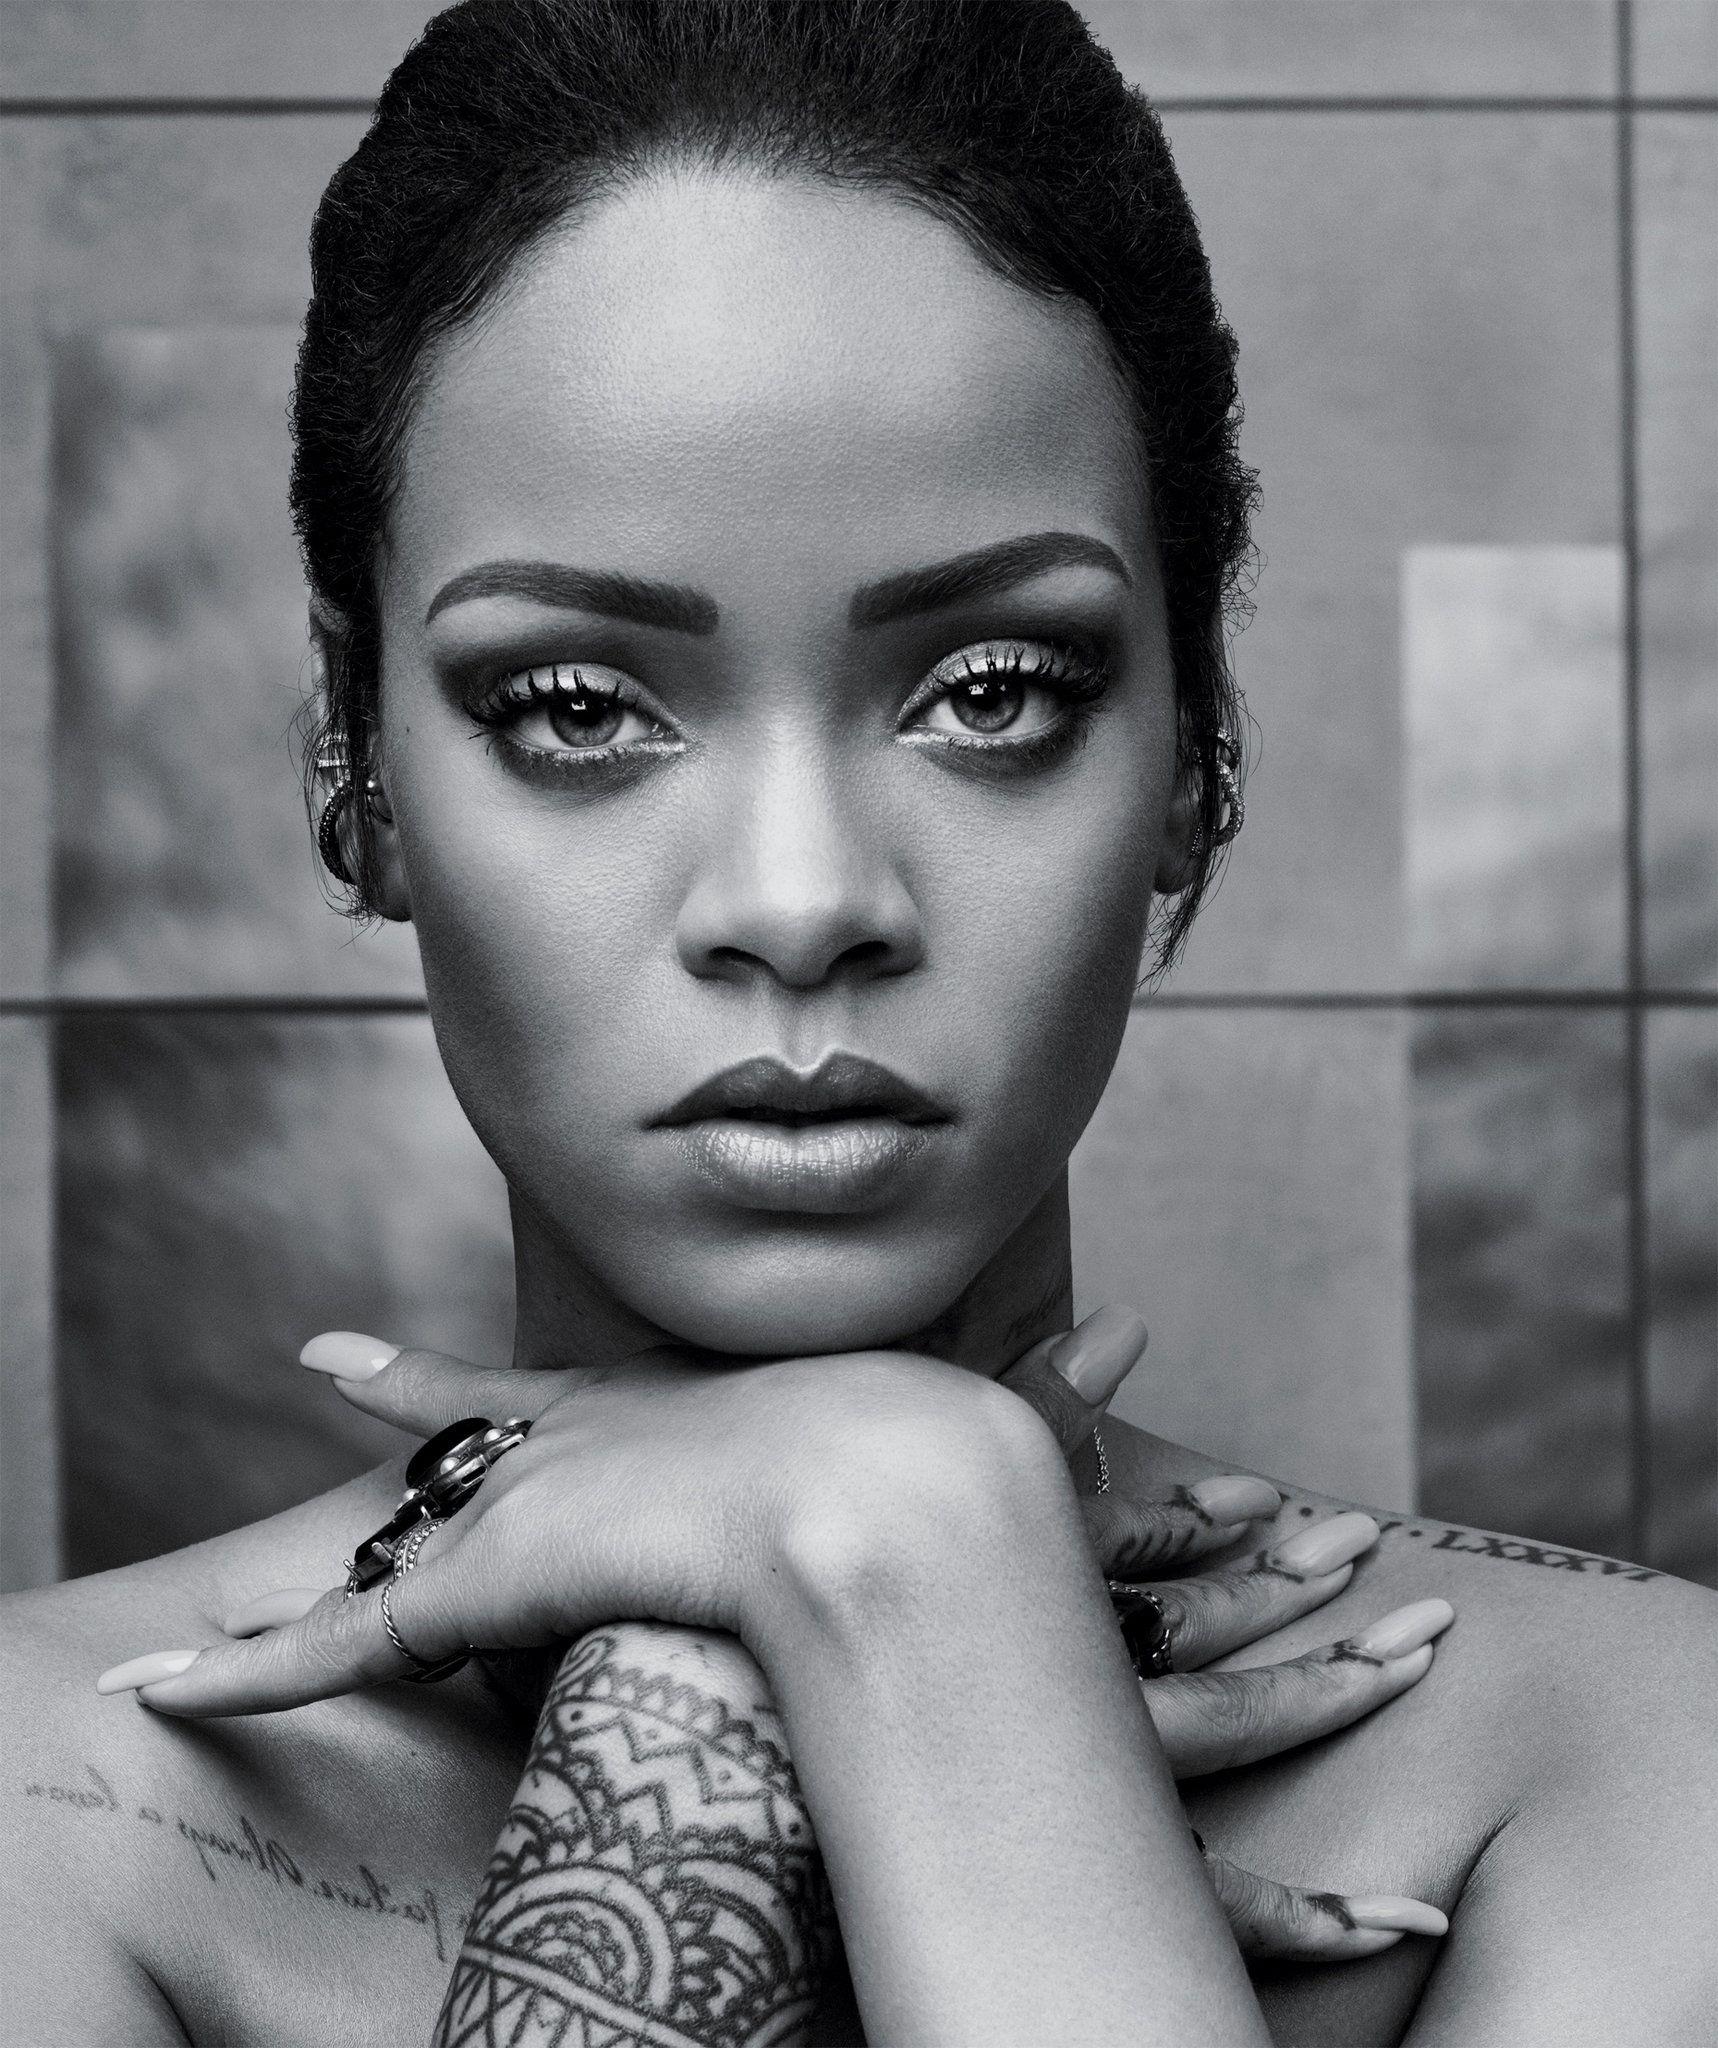 Rihanna Rihanna Rihanna Fenty Fashion Pictures